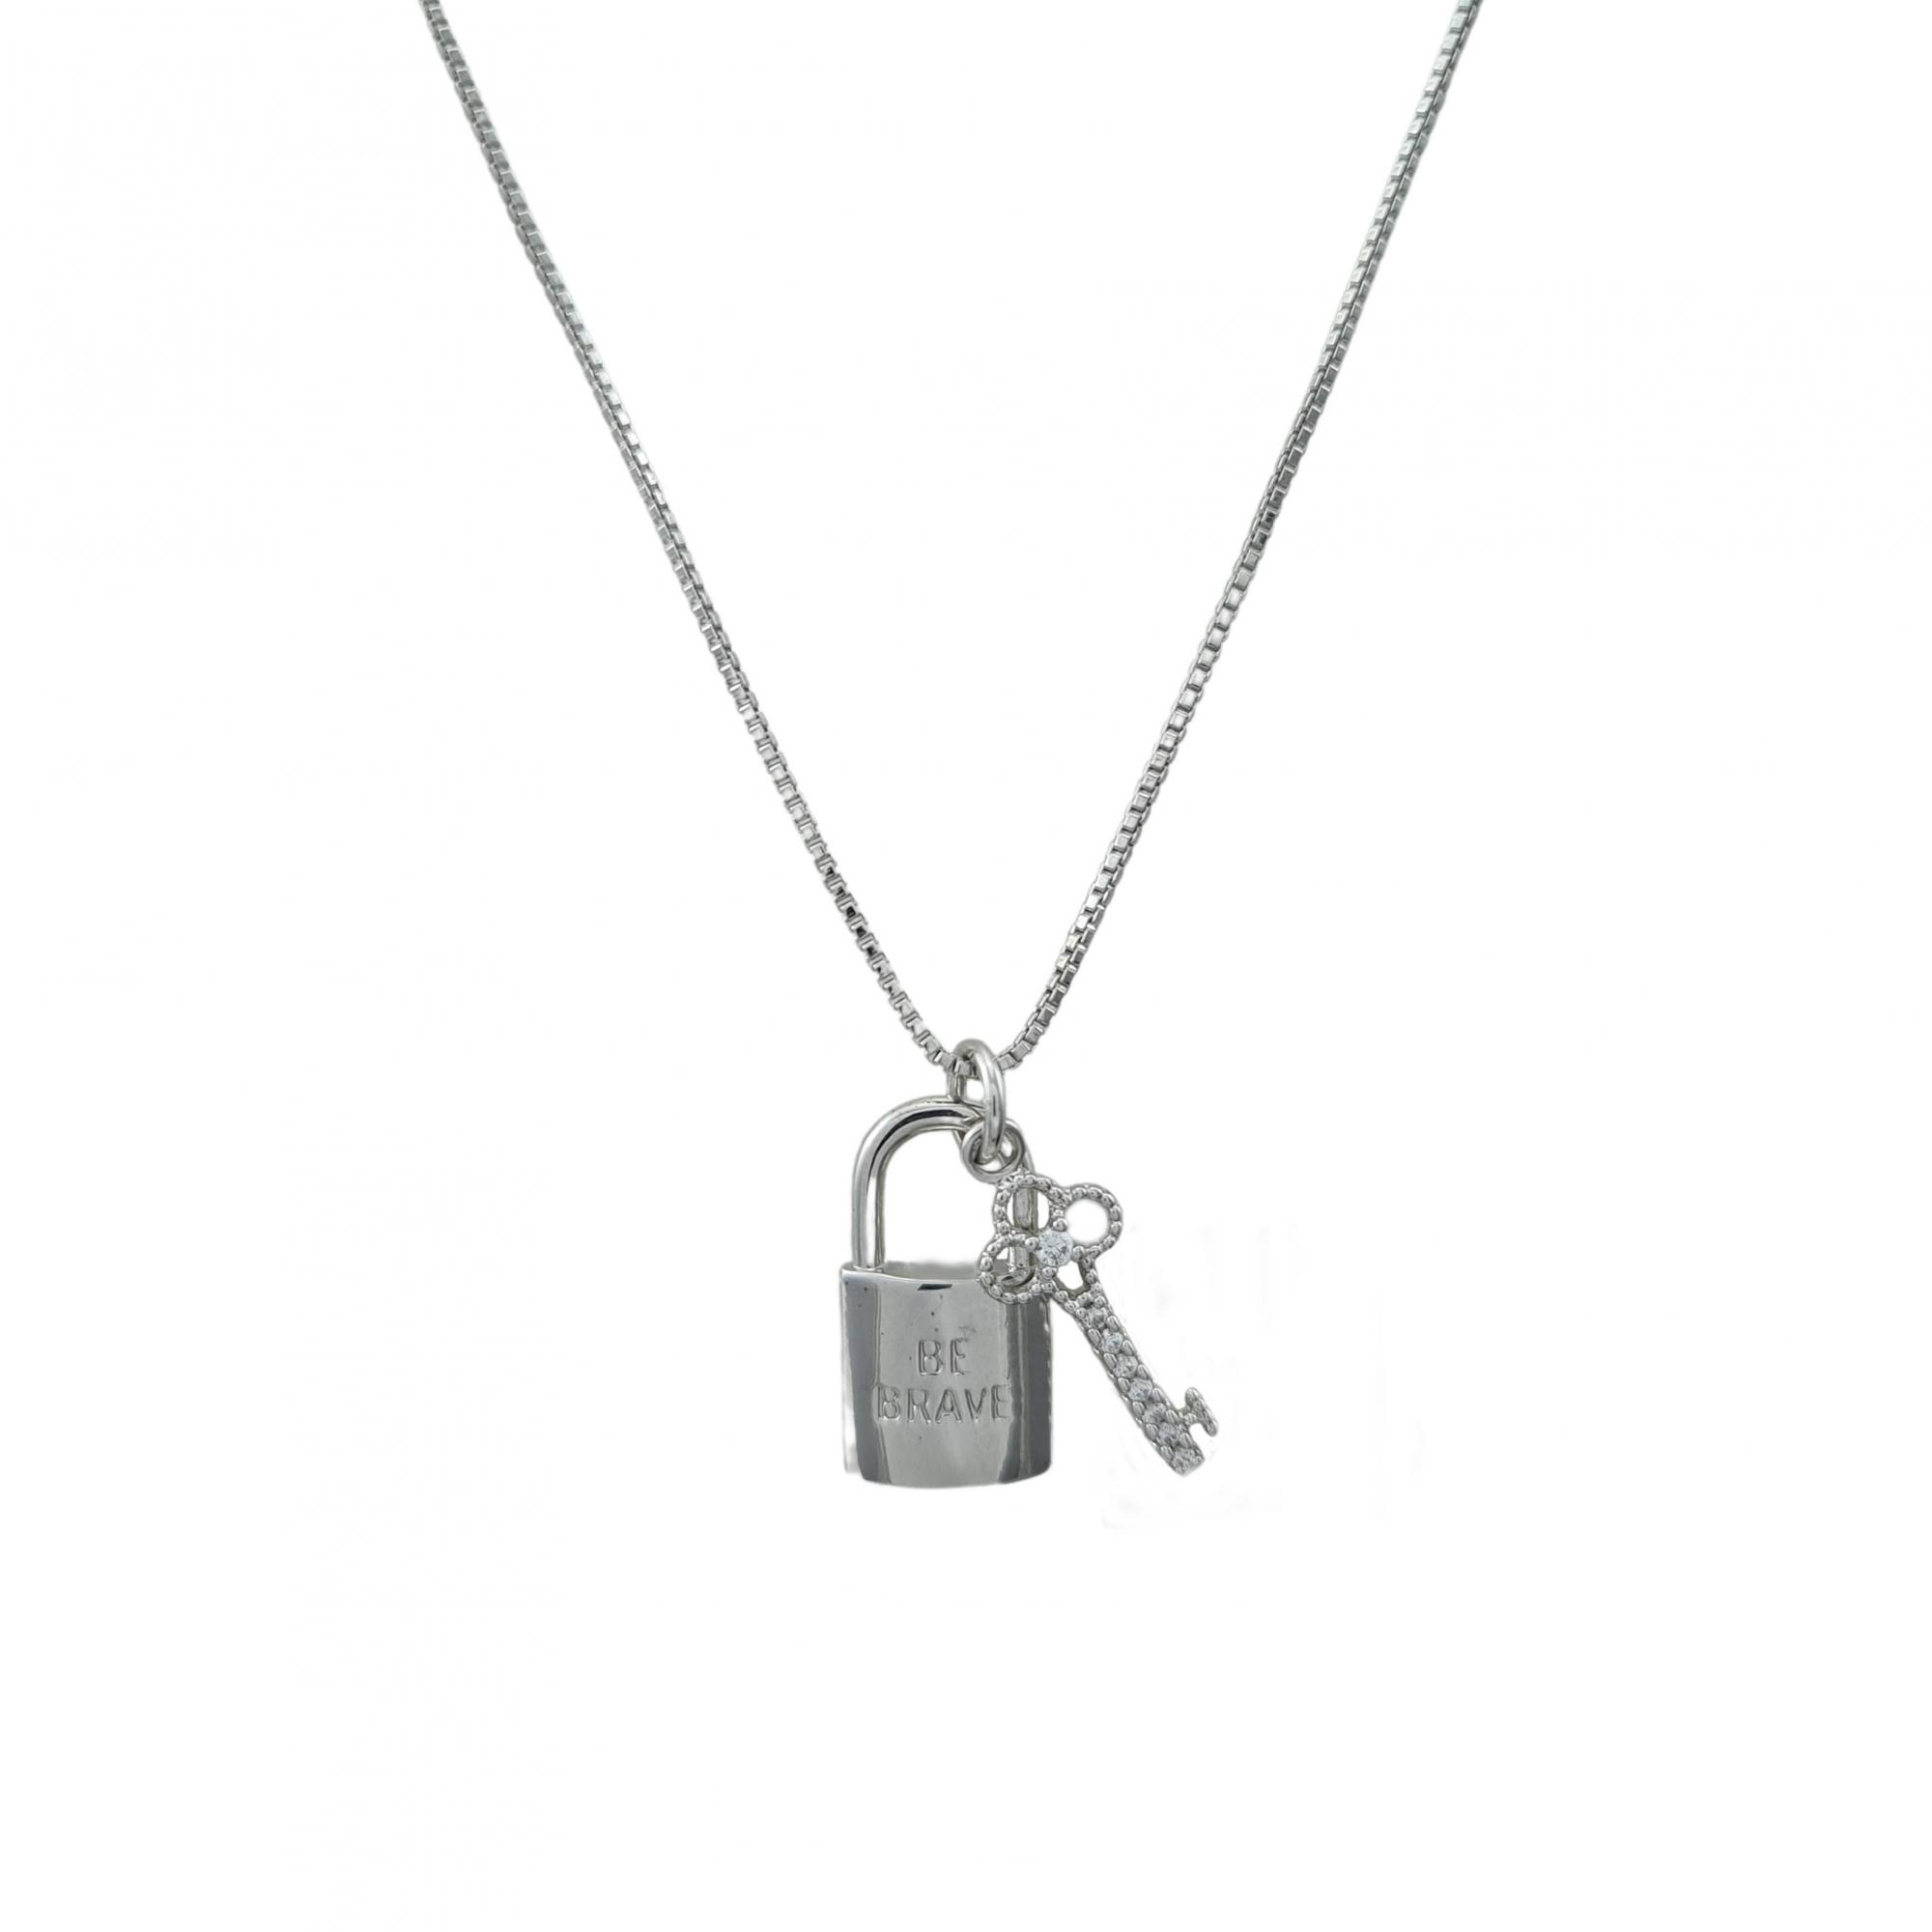 Colar Be Brave chave e cadeado banhado a ouro 18k e ródio branco